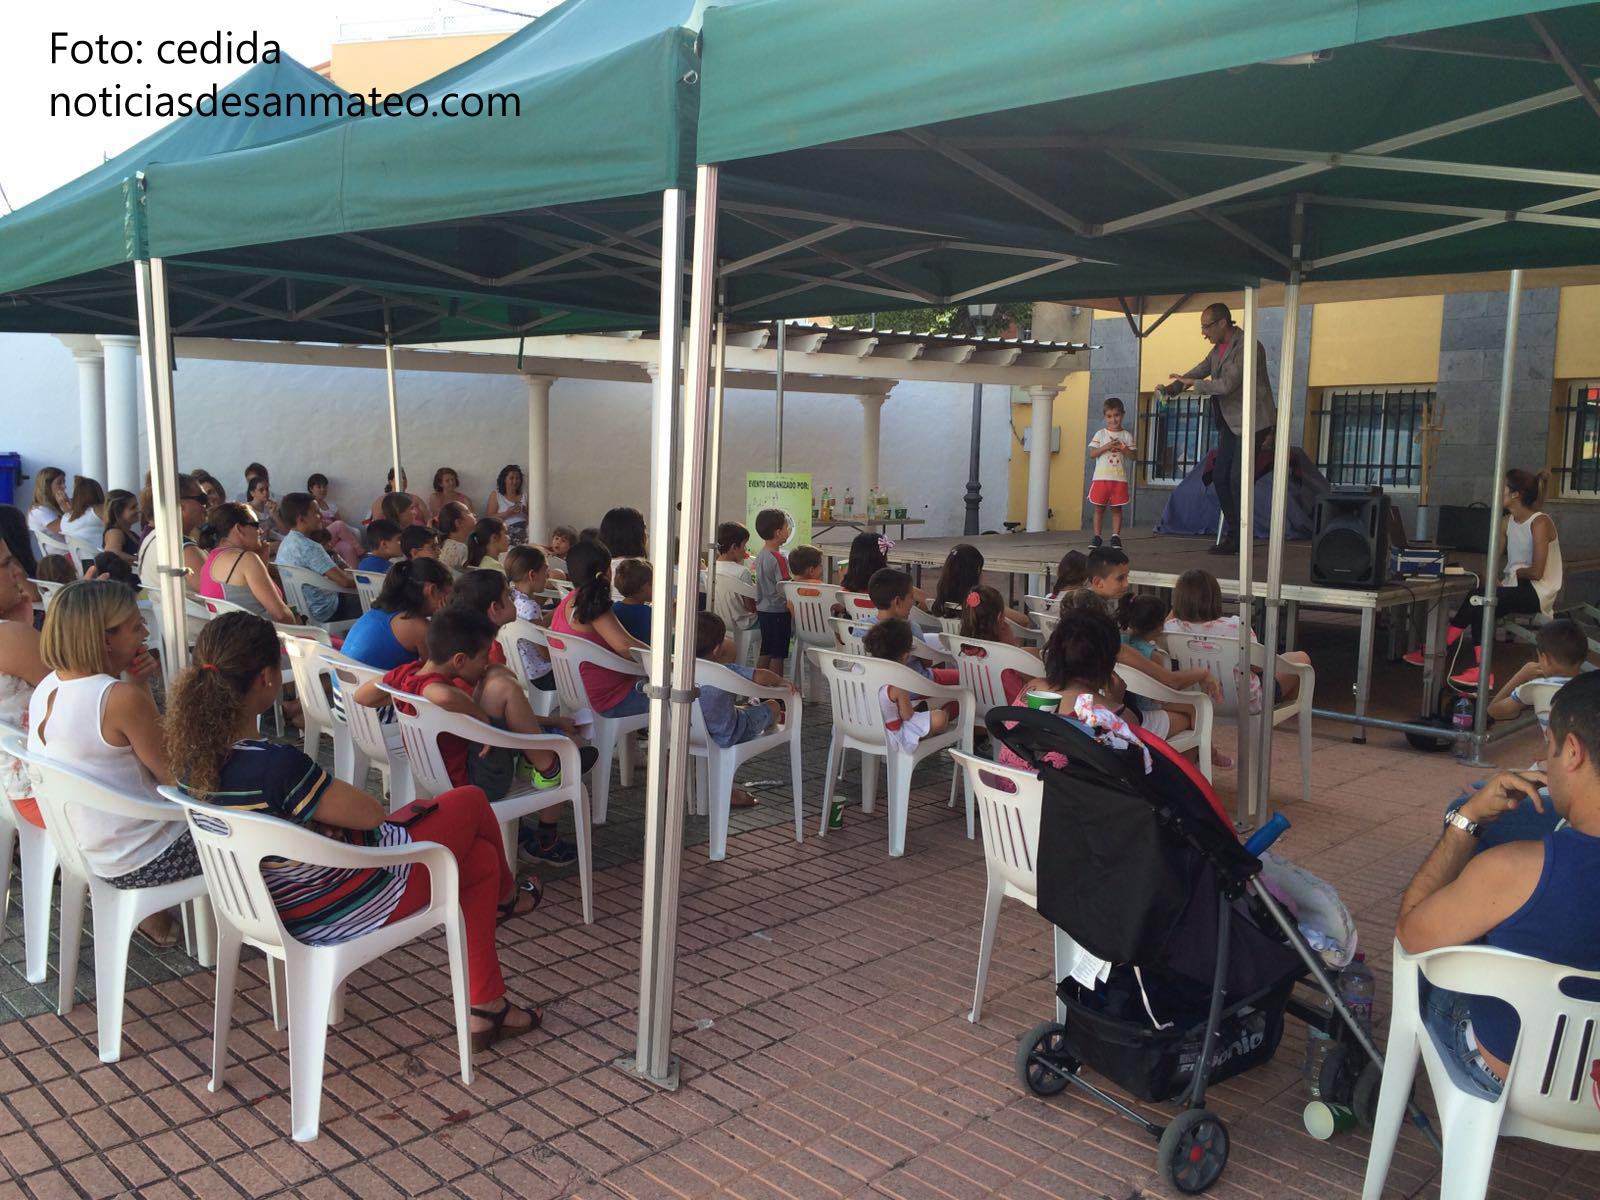 Fiesta infantil en La Solana 14 julio 2016